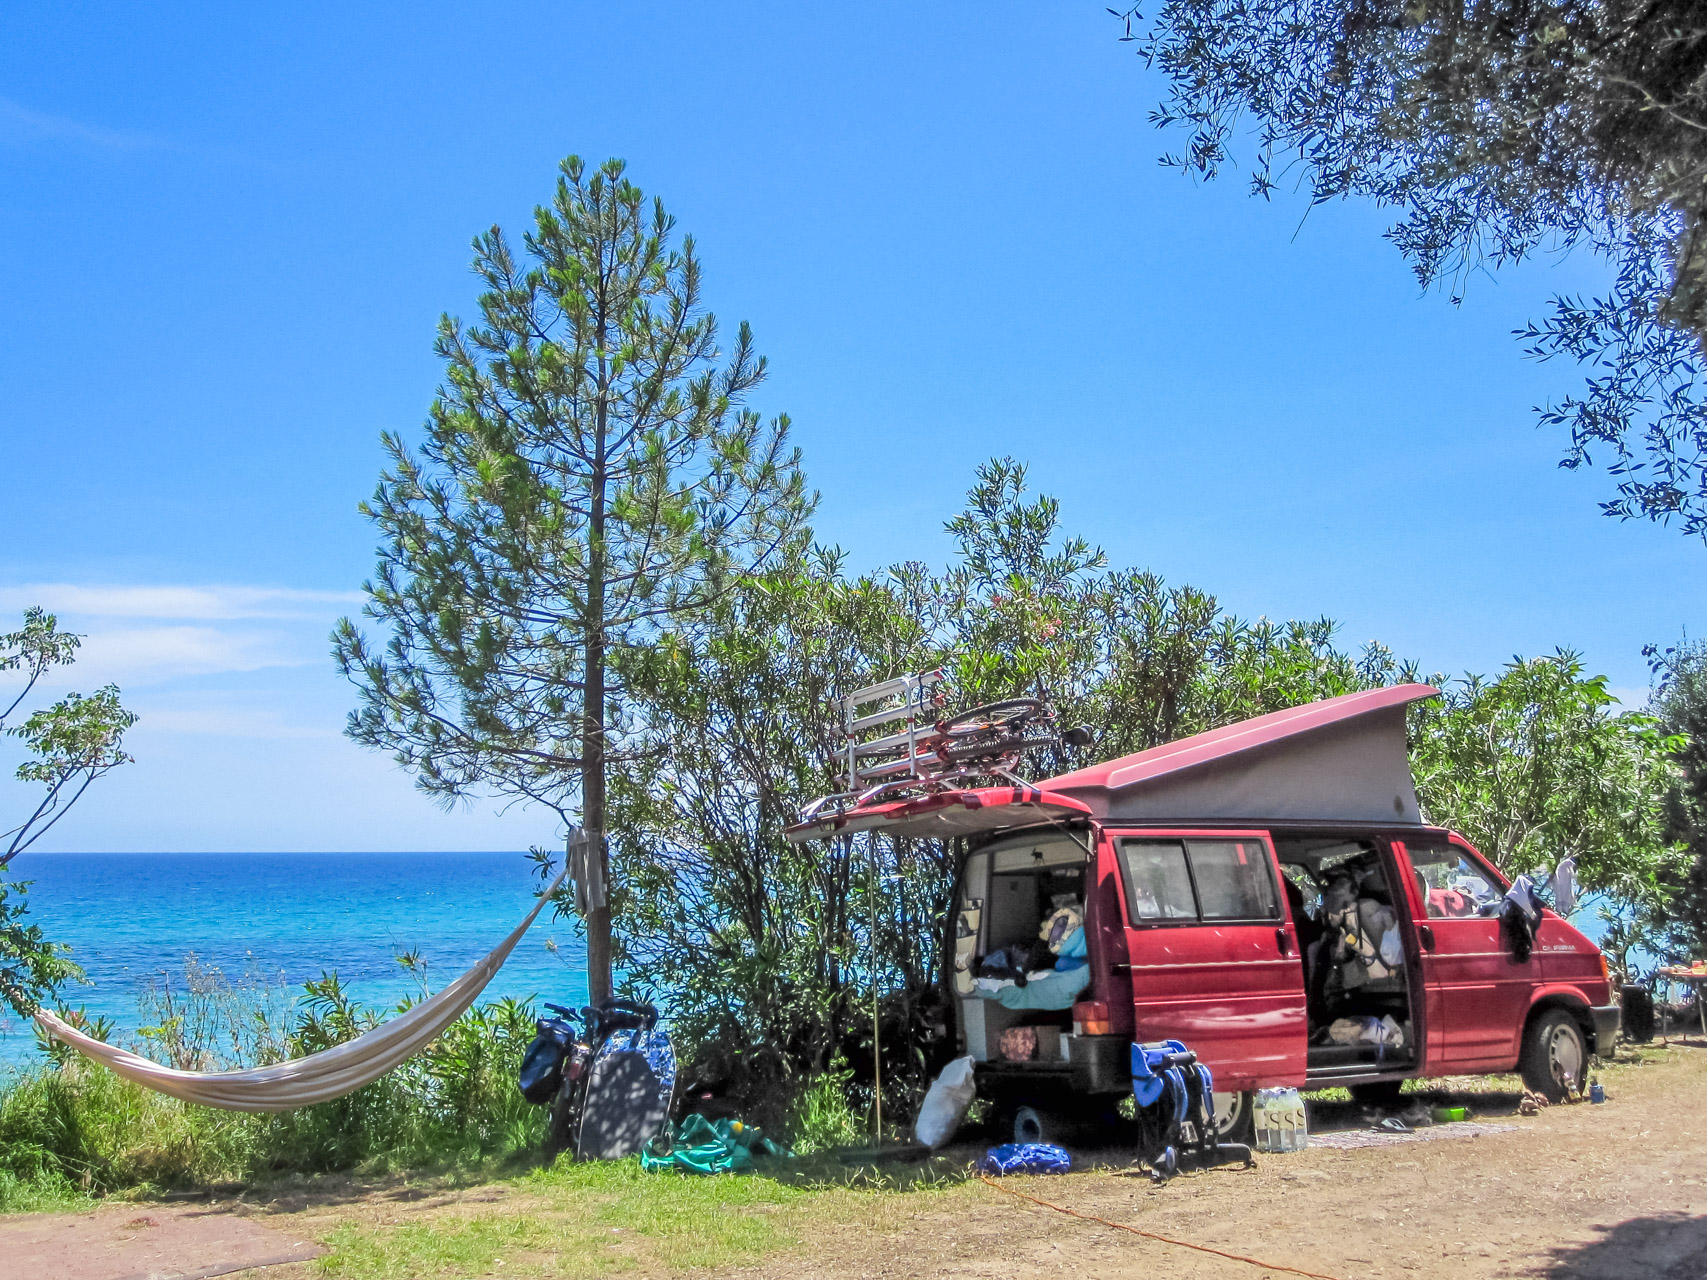 Camping Le Grand Bleu